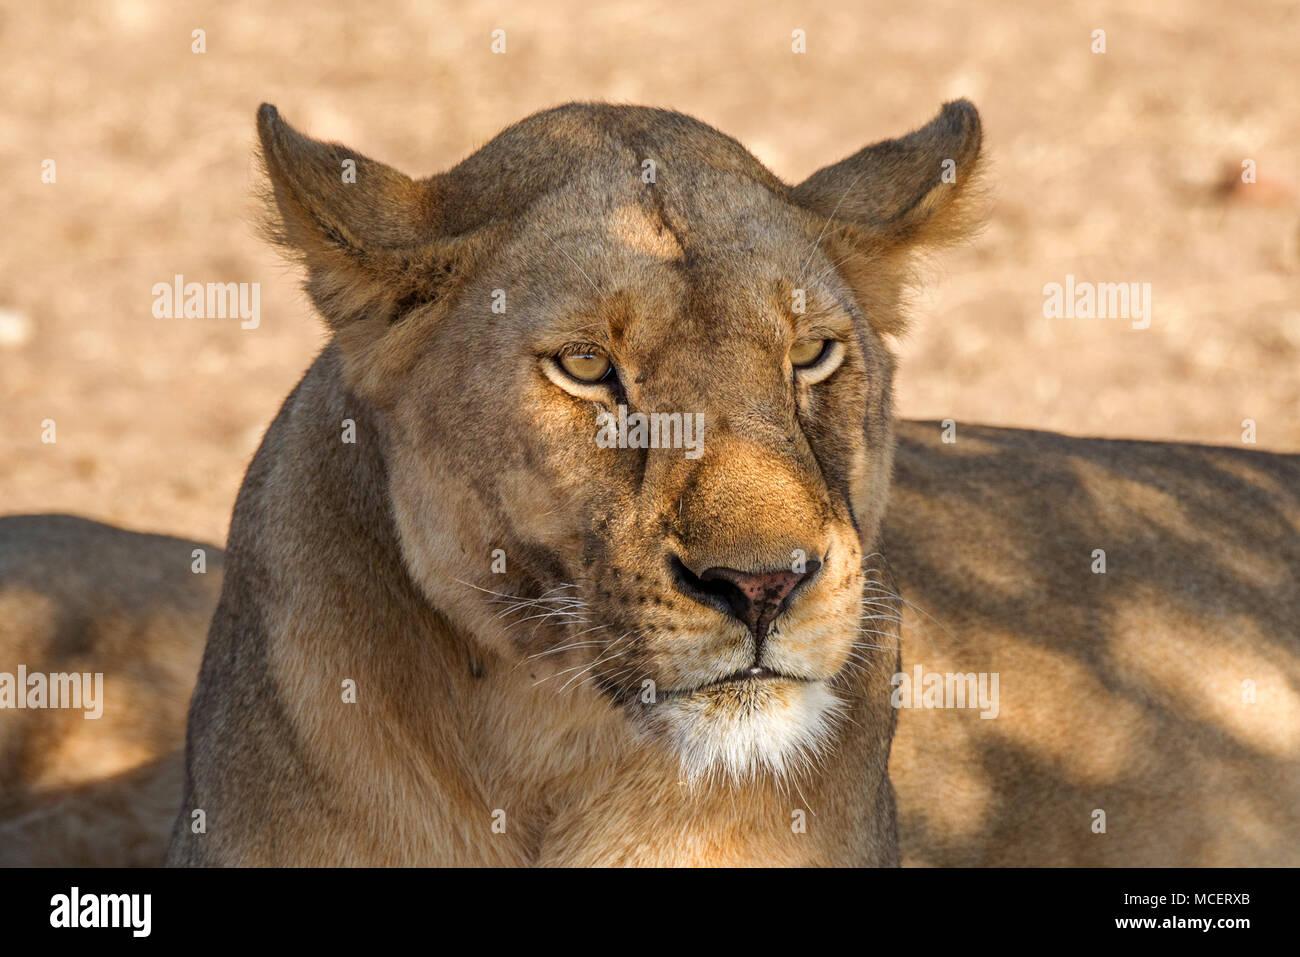 FEMALE LION (PANTHERA LEO) RESTING IN THE SHADE, SERENGETI NATIONAL PARK, TANZANIA Stock Photo